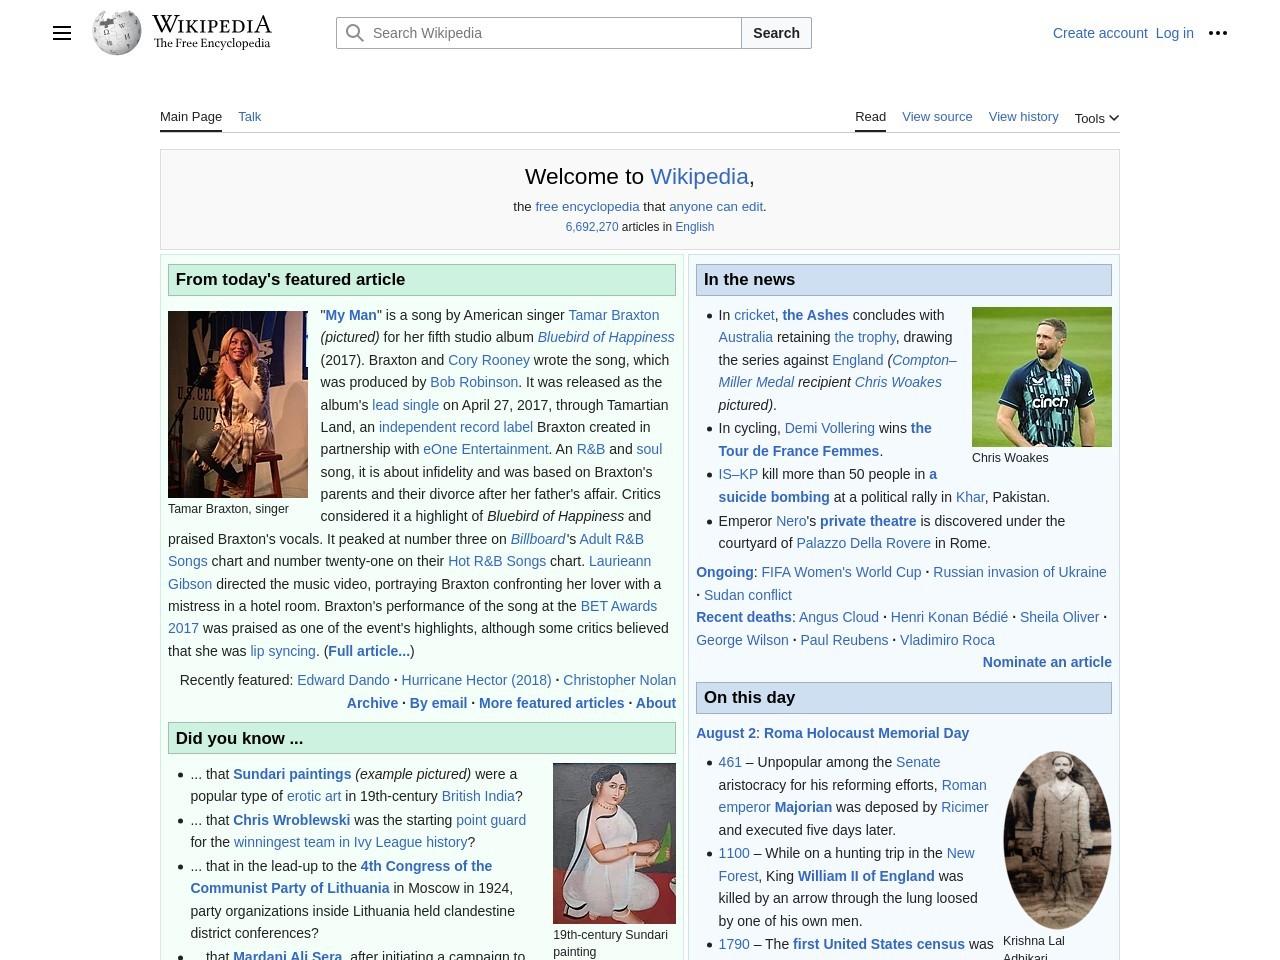 https://en.wikipedia.org/wiki/Sieve_analysis